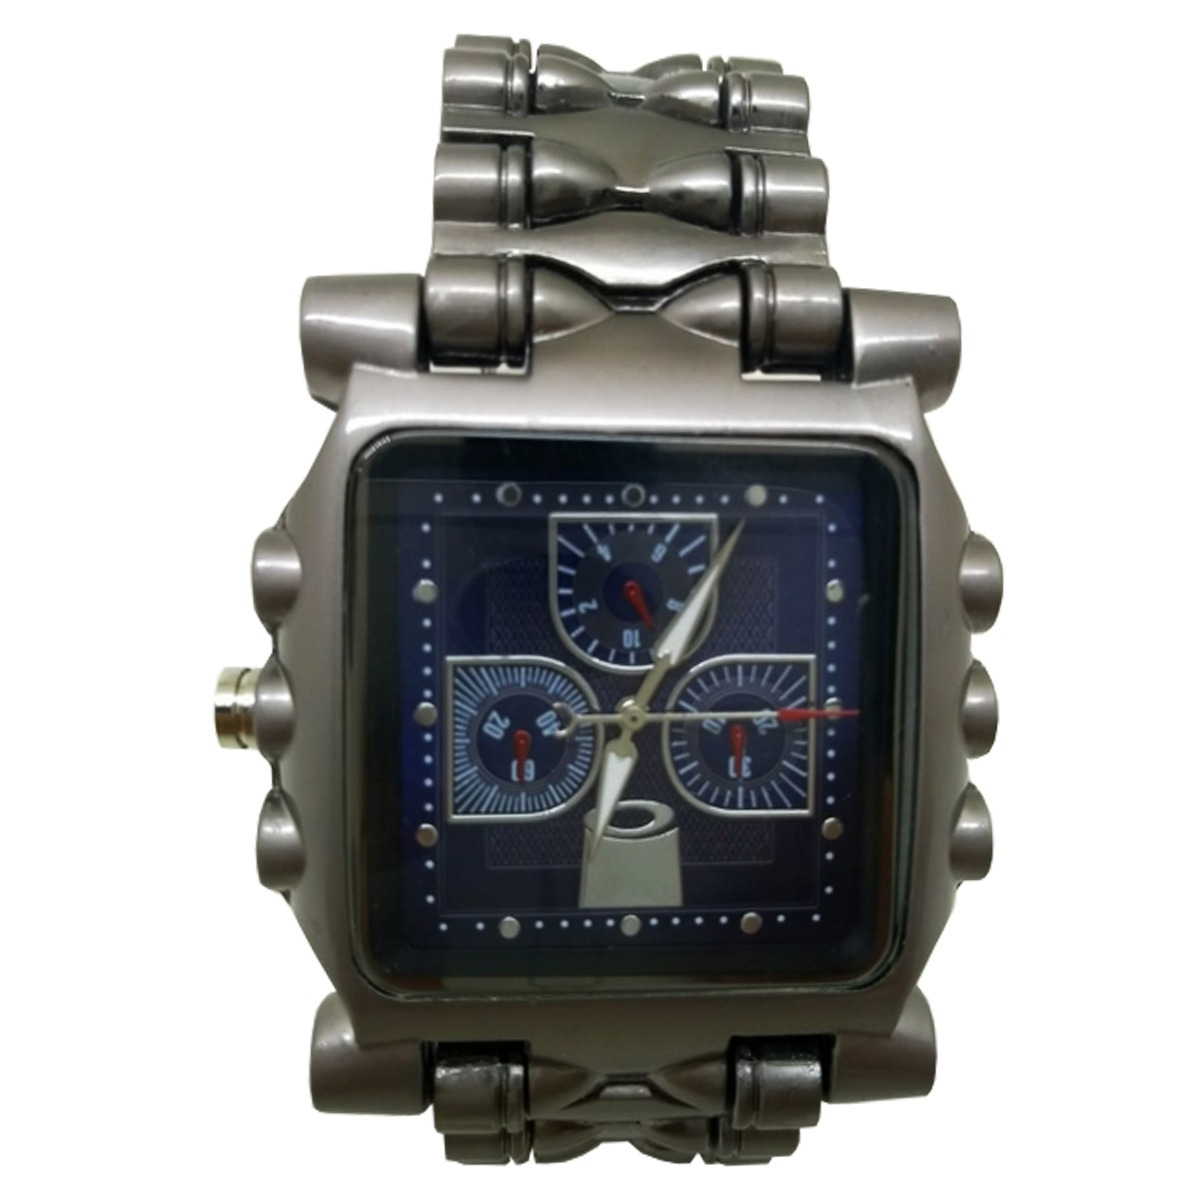 ccad3961043 Relógio Oakley Tank Minute Machine Masculino Style Top - R  69